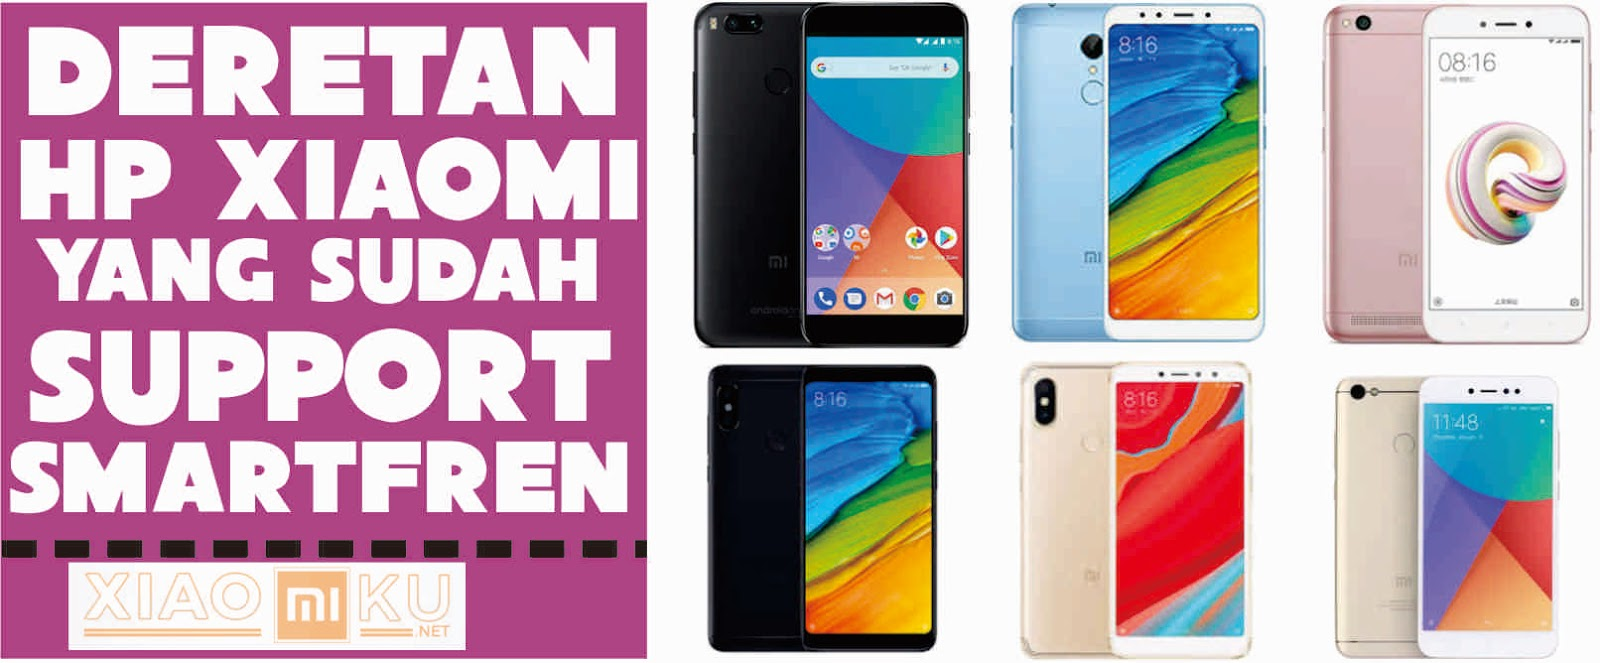 Daftar Deretan Hp Xiaomi Support 4g Smartfren Paling Update Miuiku